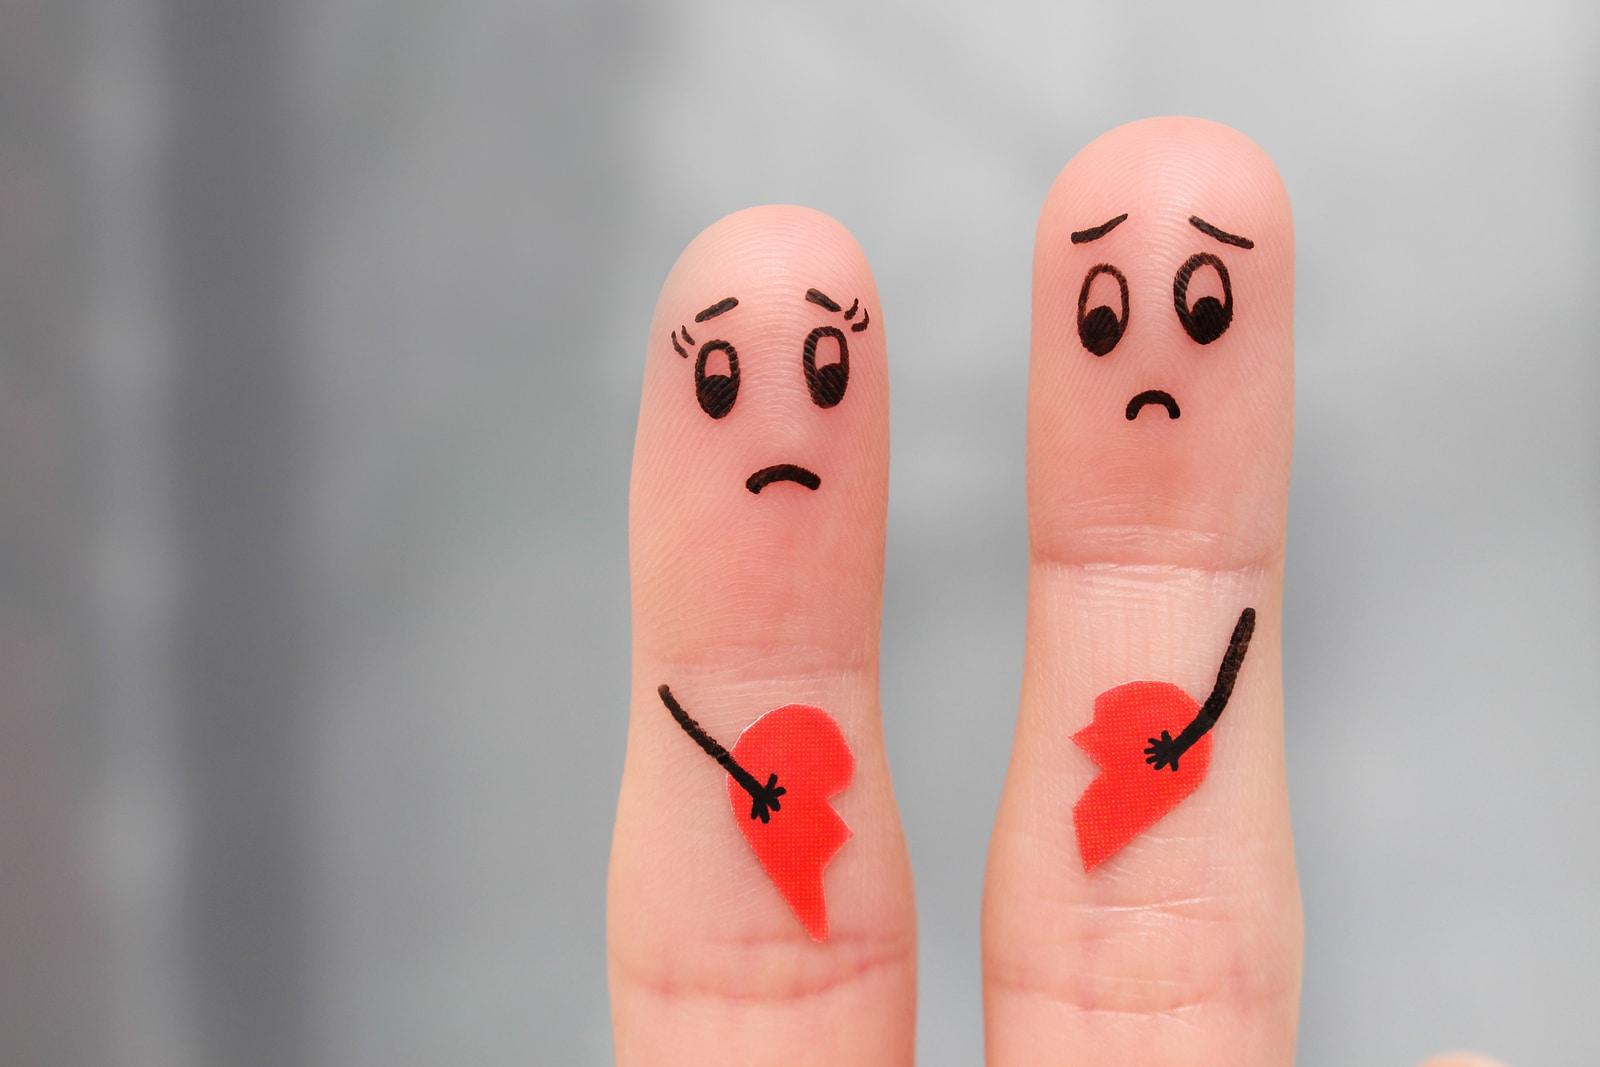 Frases De Desamor Cortas Y Tristes Frases